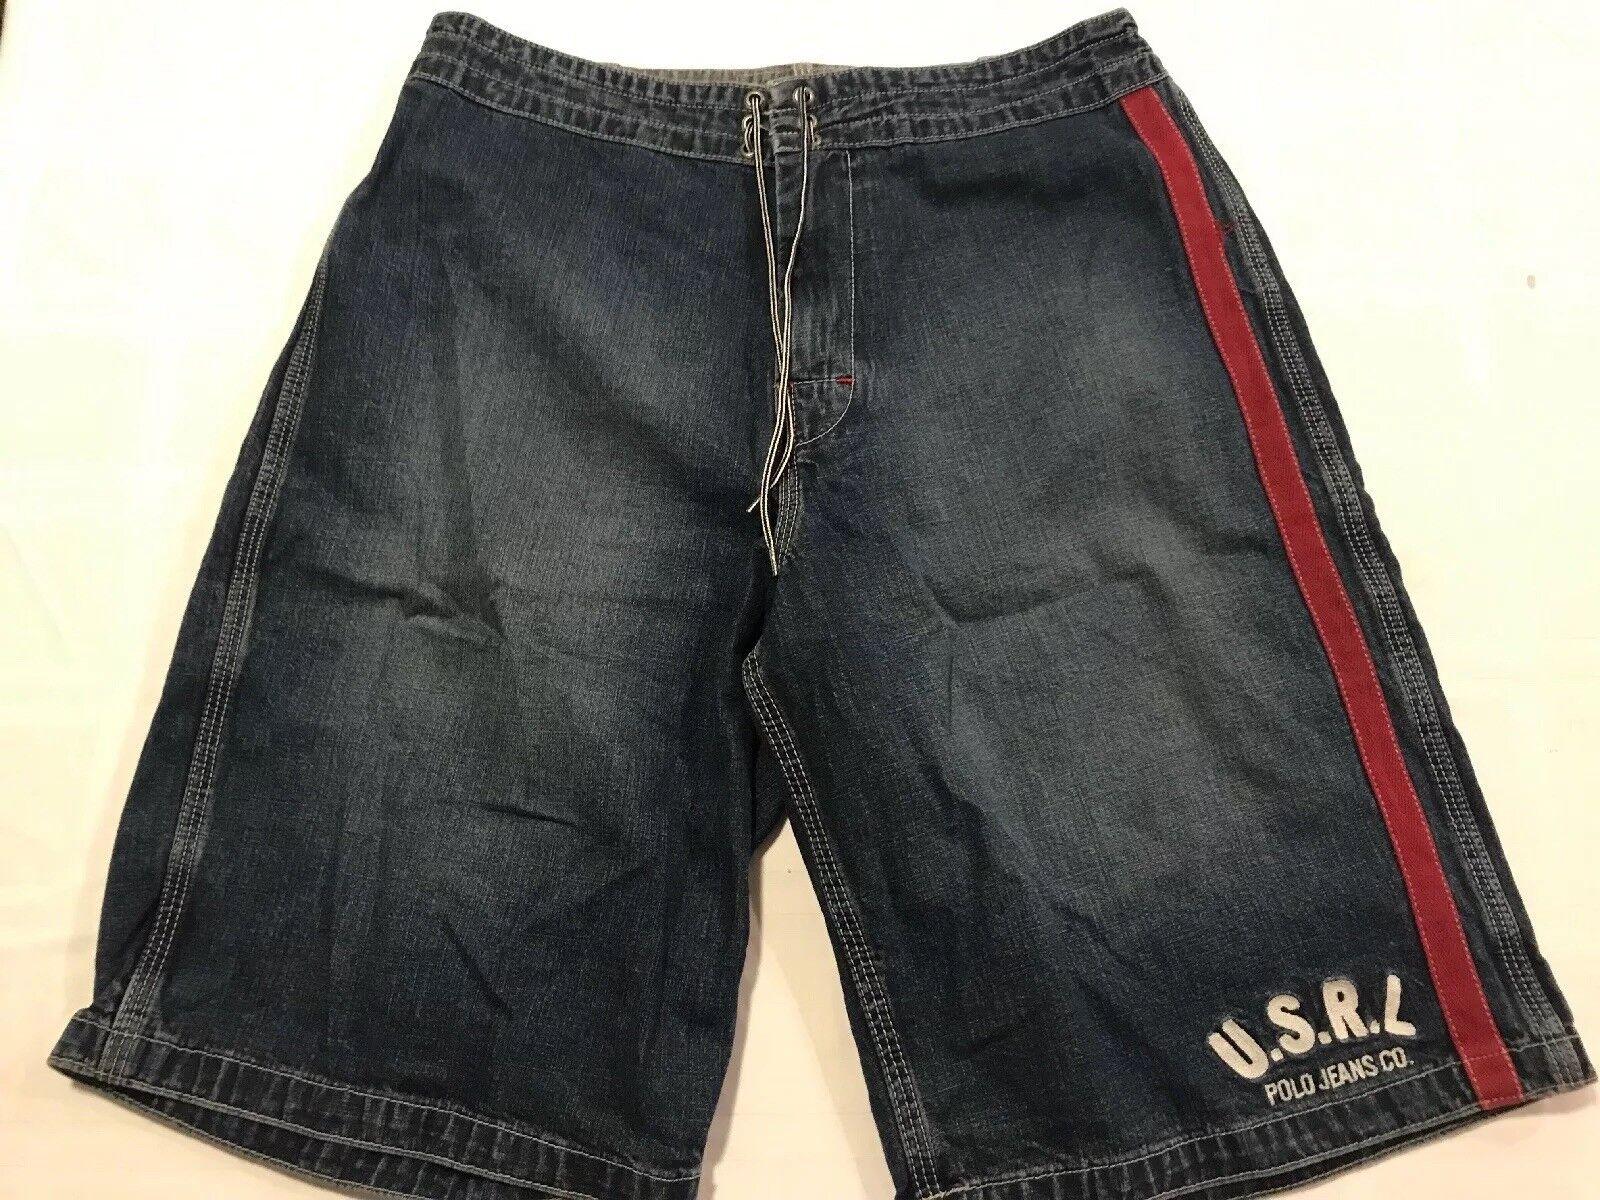 Ralph Lauren Polo Jeans Company Cotton Board Short Style Denim Shorts Mens M TS8